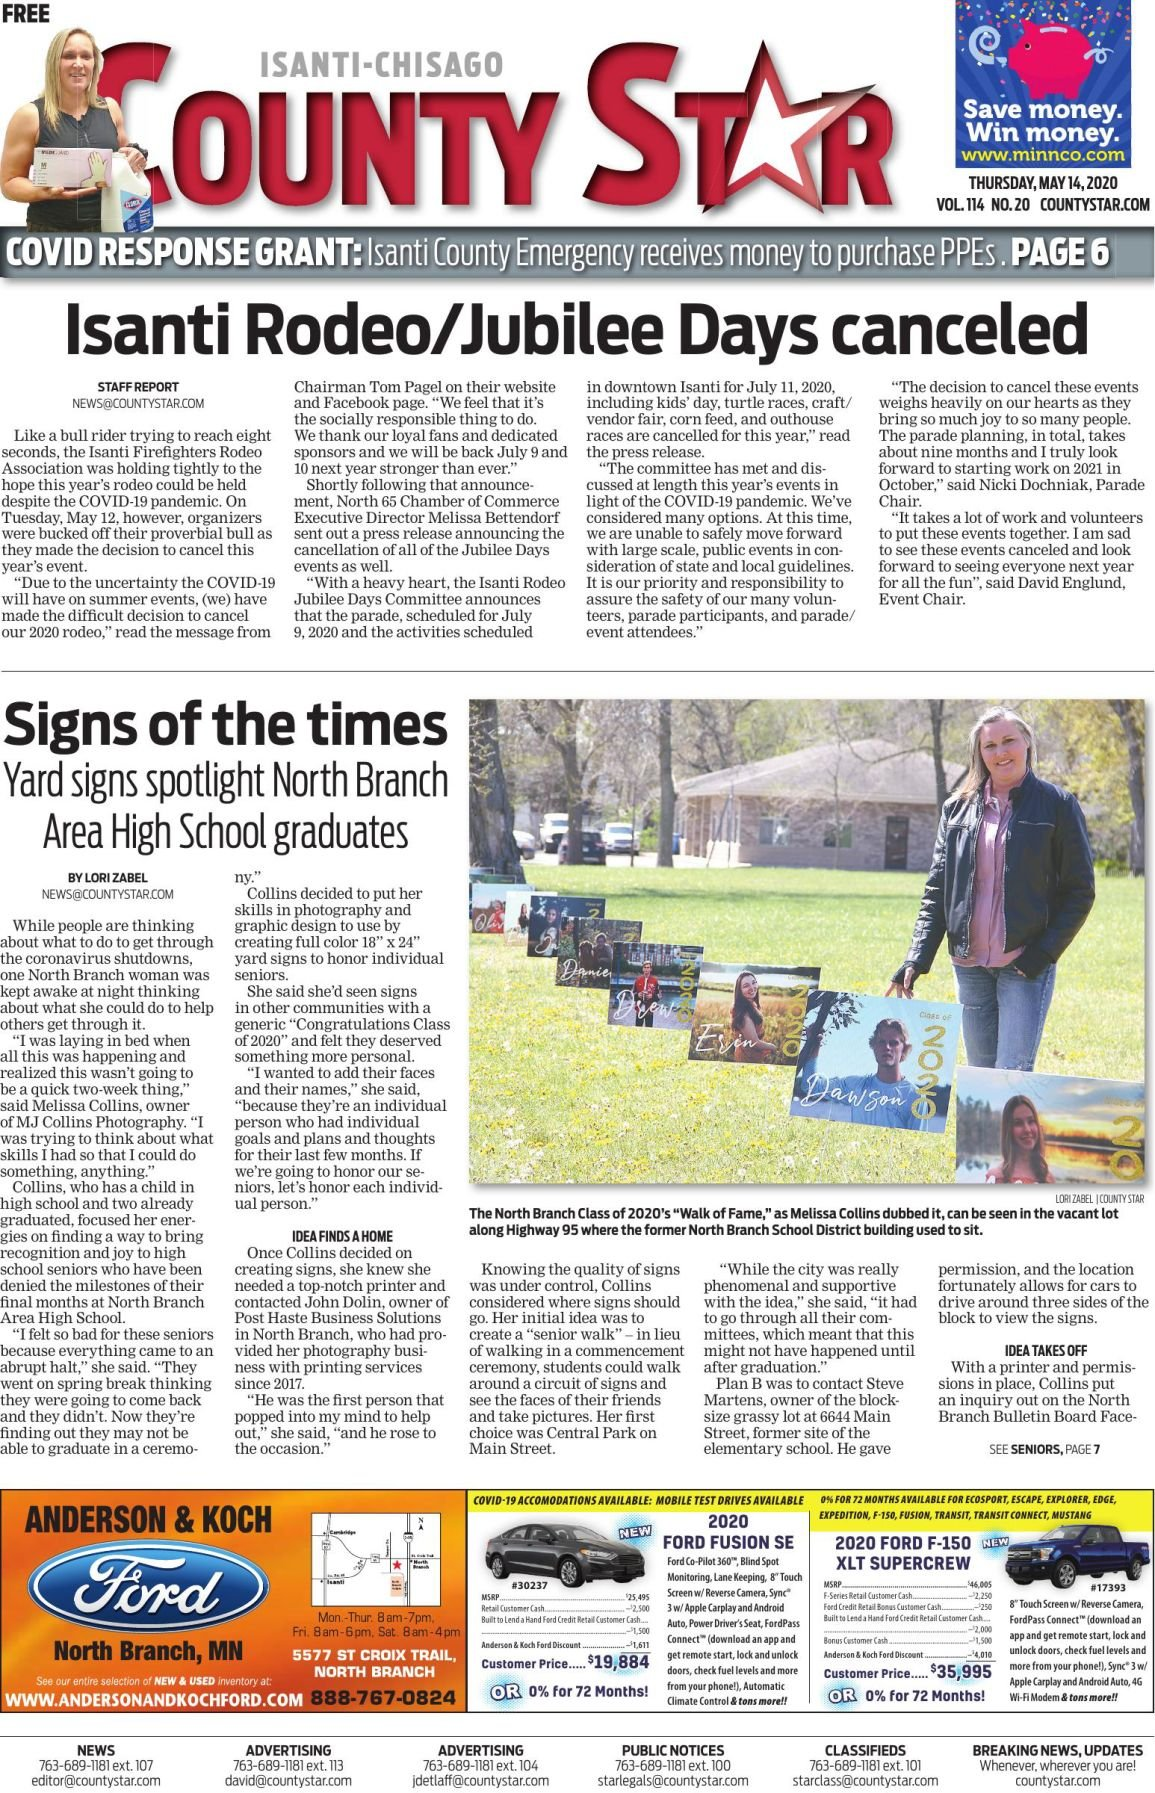 Isanti-Chisago County Star May 14, 2020 e-edition